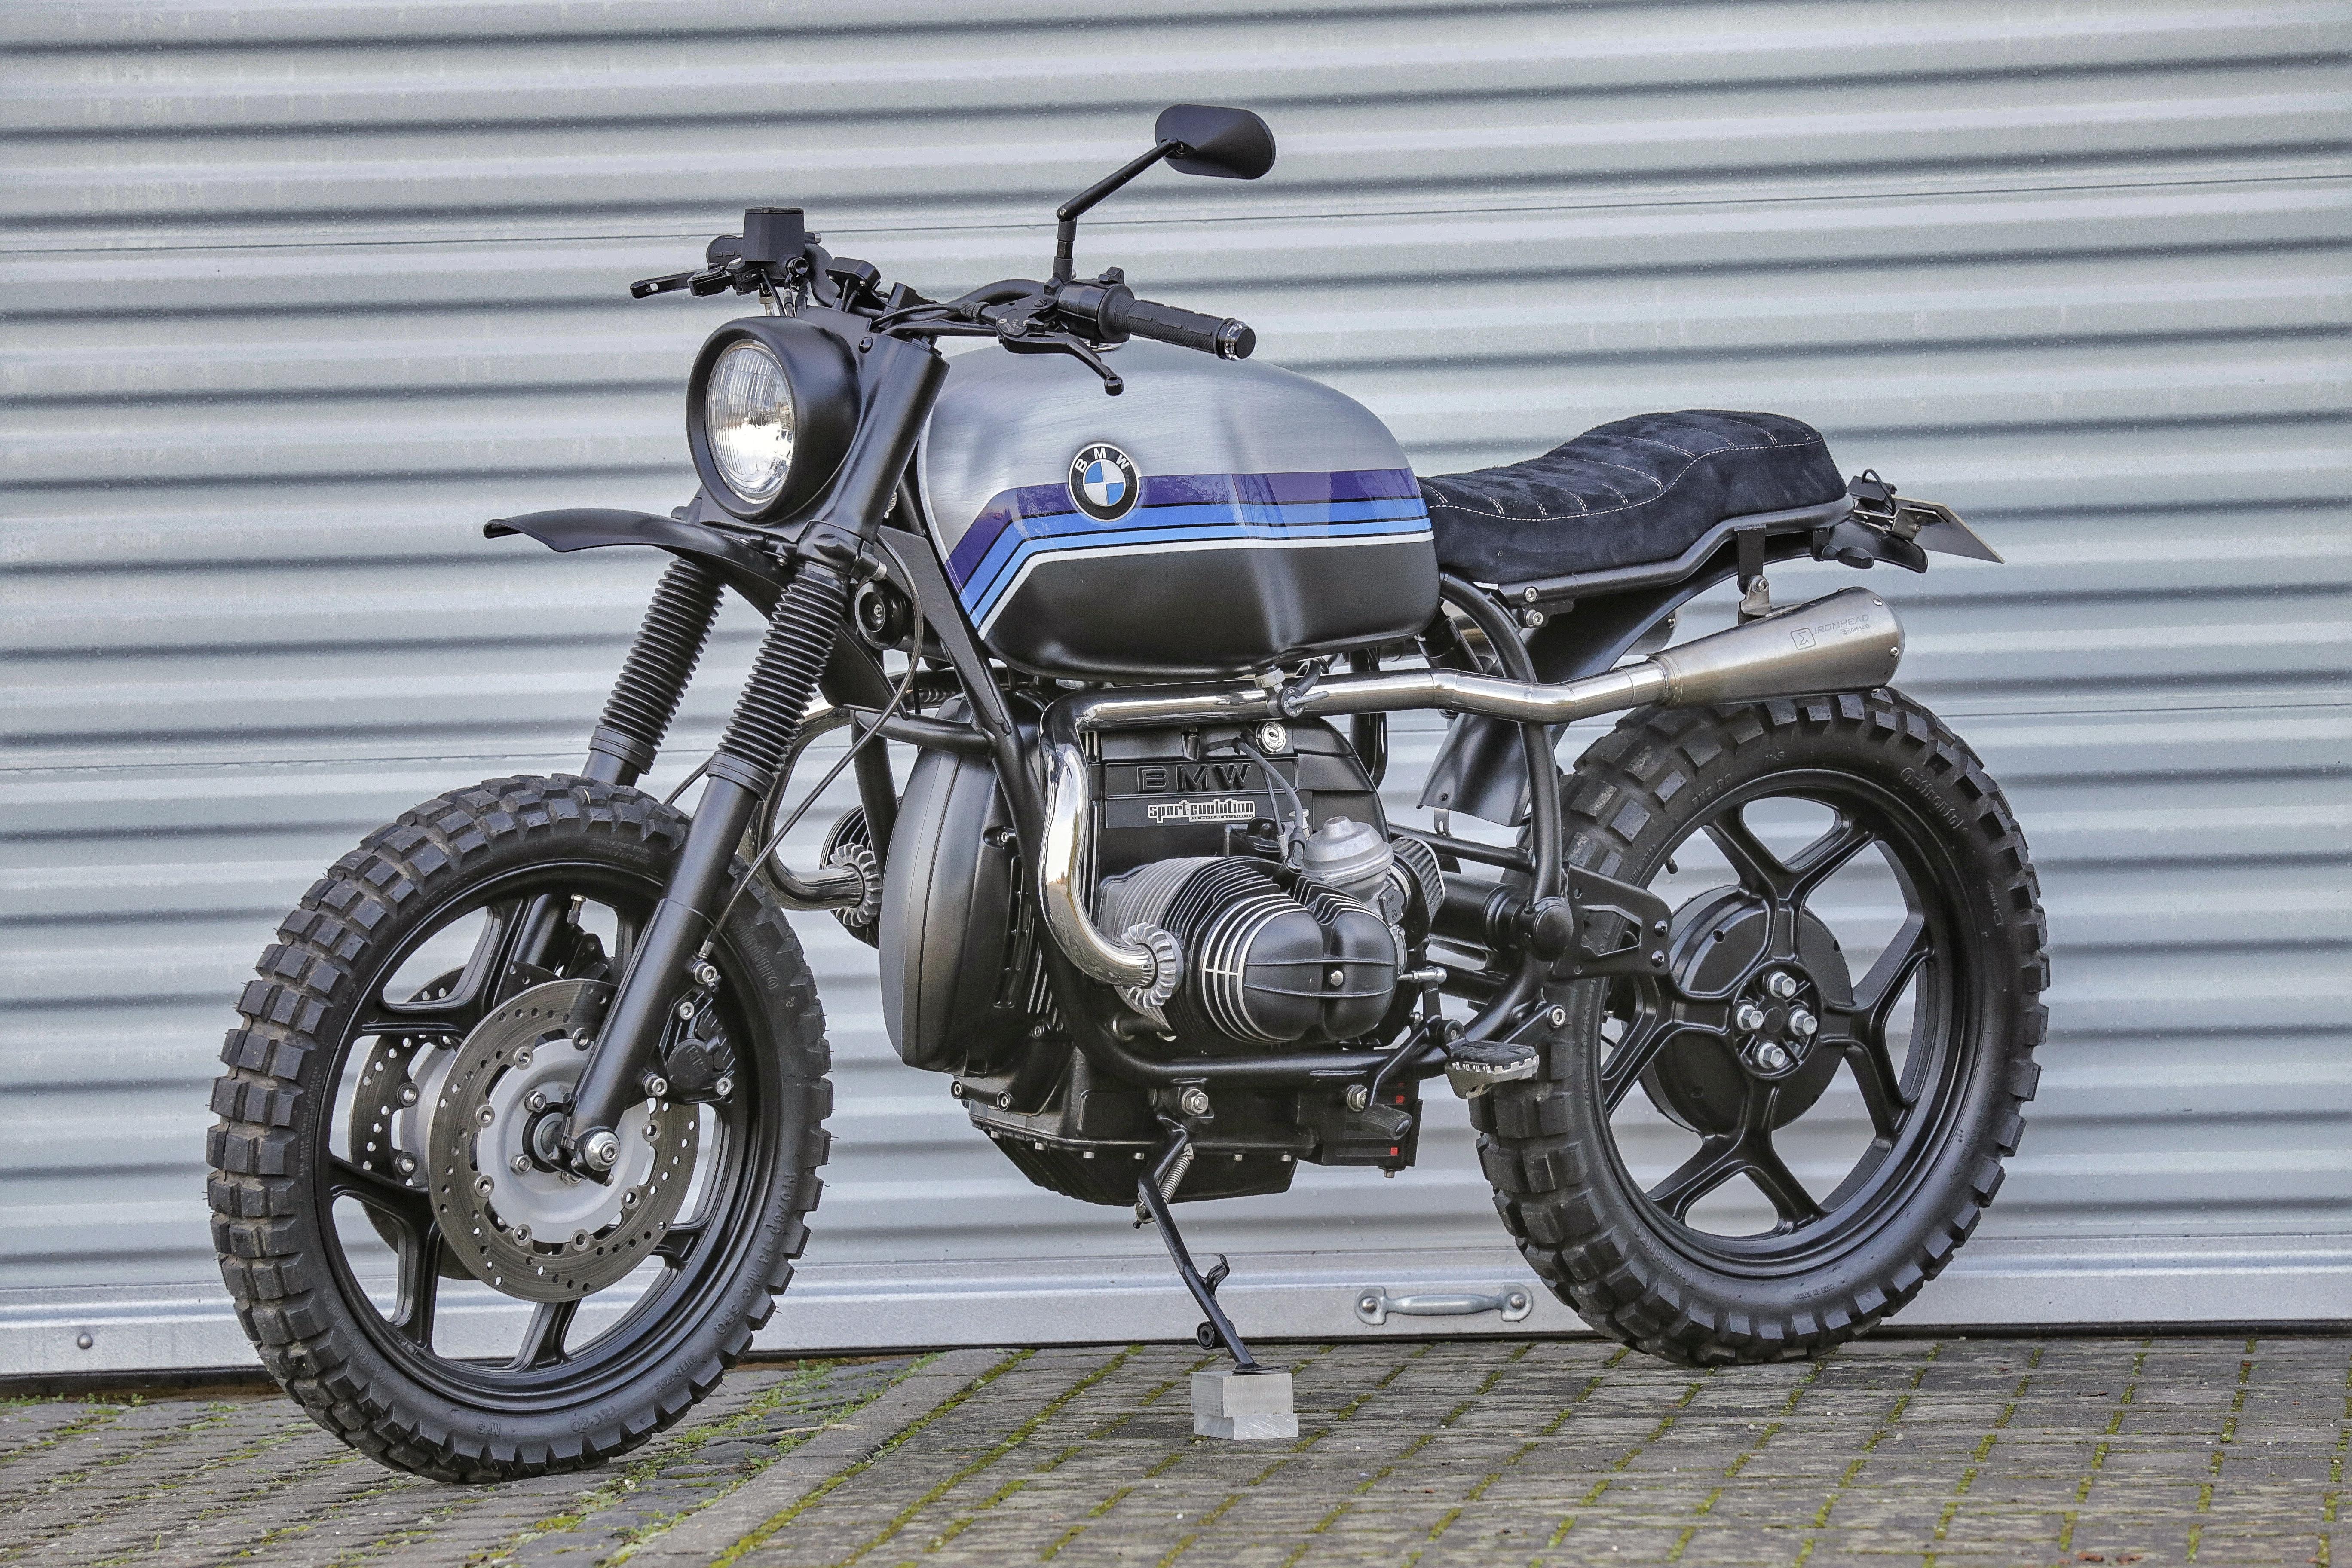 BMW Scrambler Concept Bike